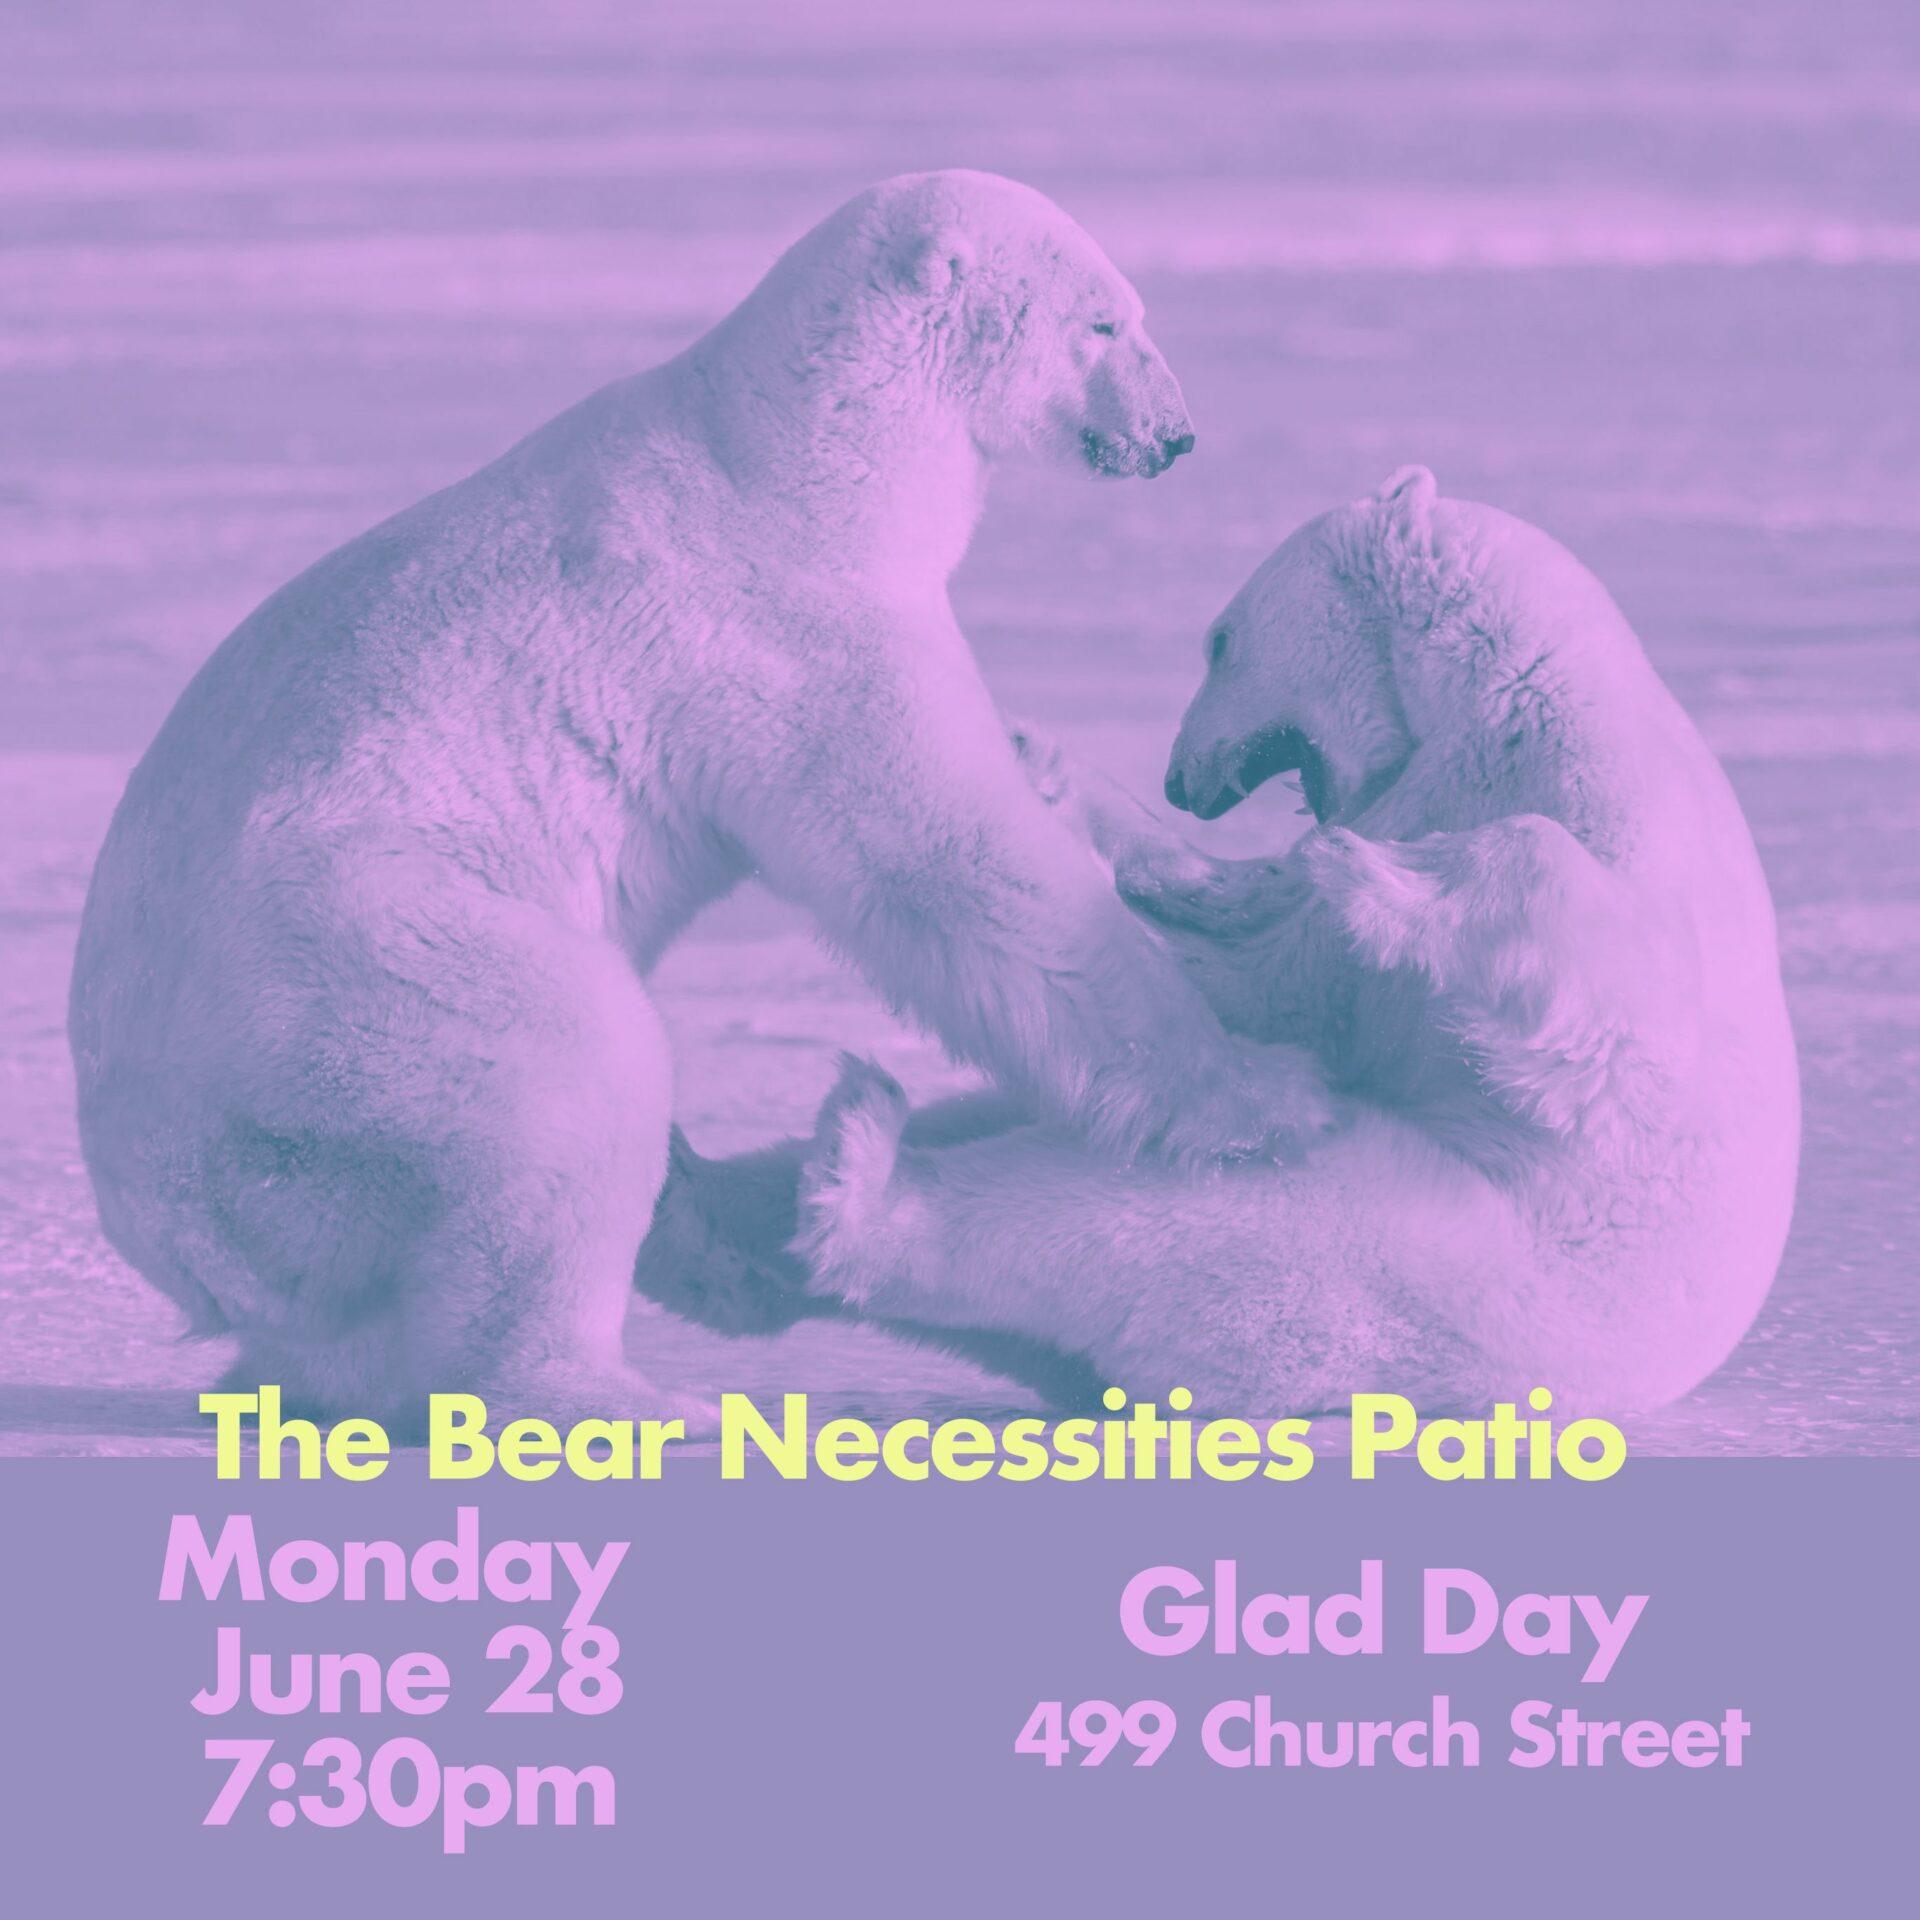 The Bear Necessities Patio